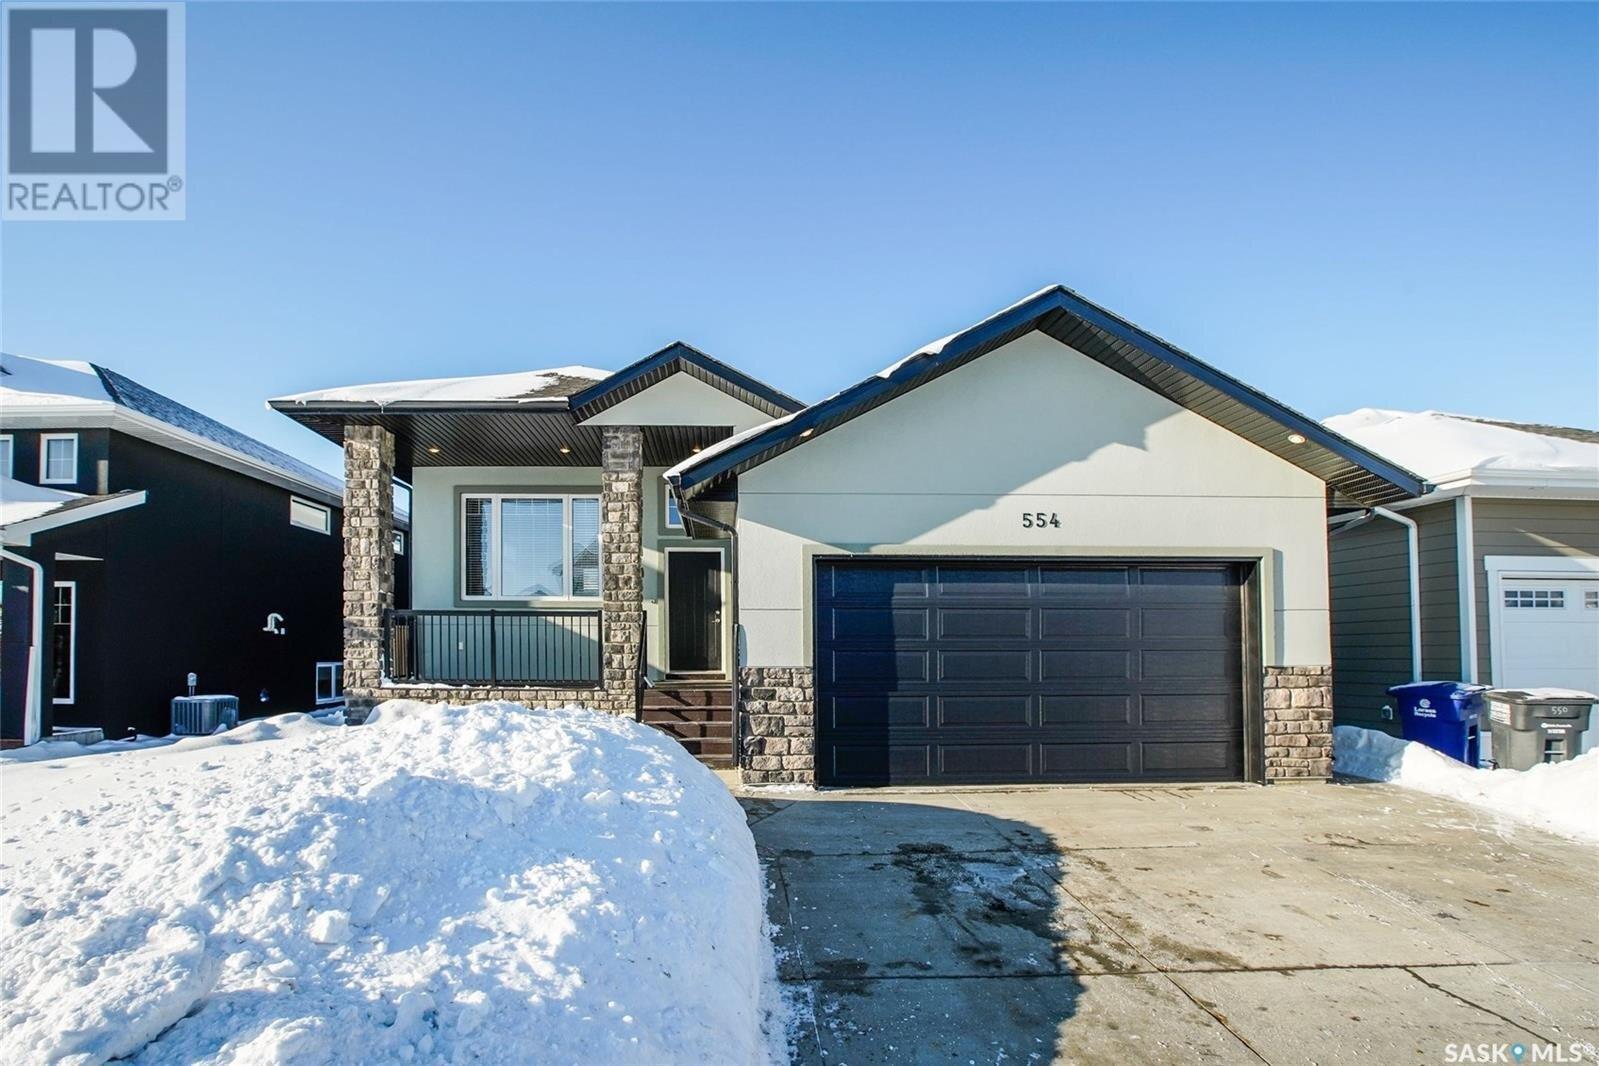 House for sale at 554 Pritchard Cres Saskatoon Saskatchewan - MLS: SK834046